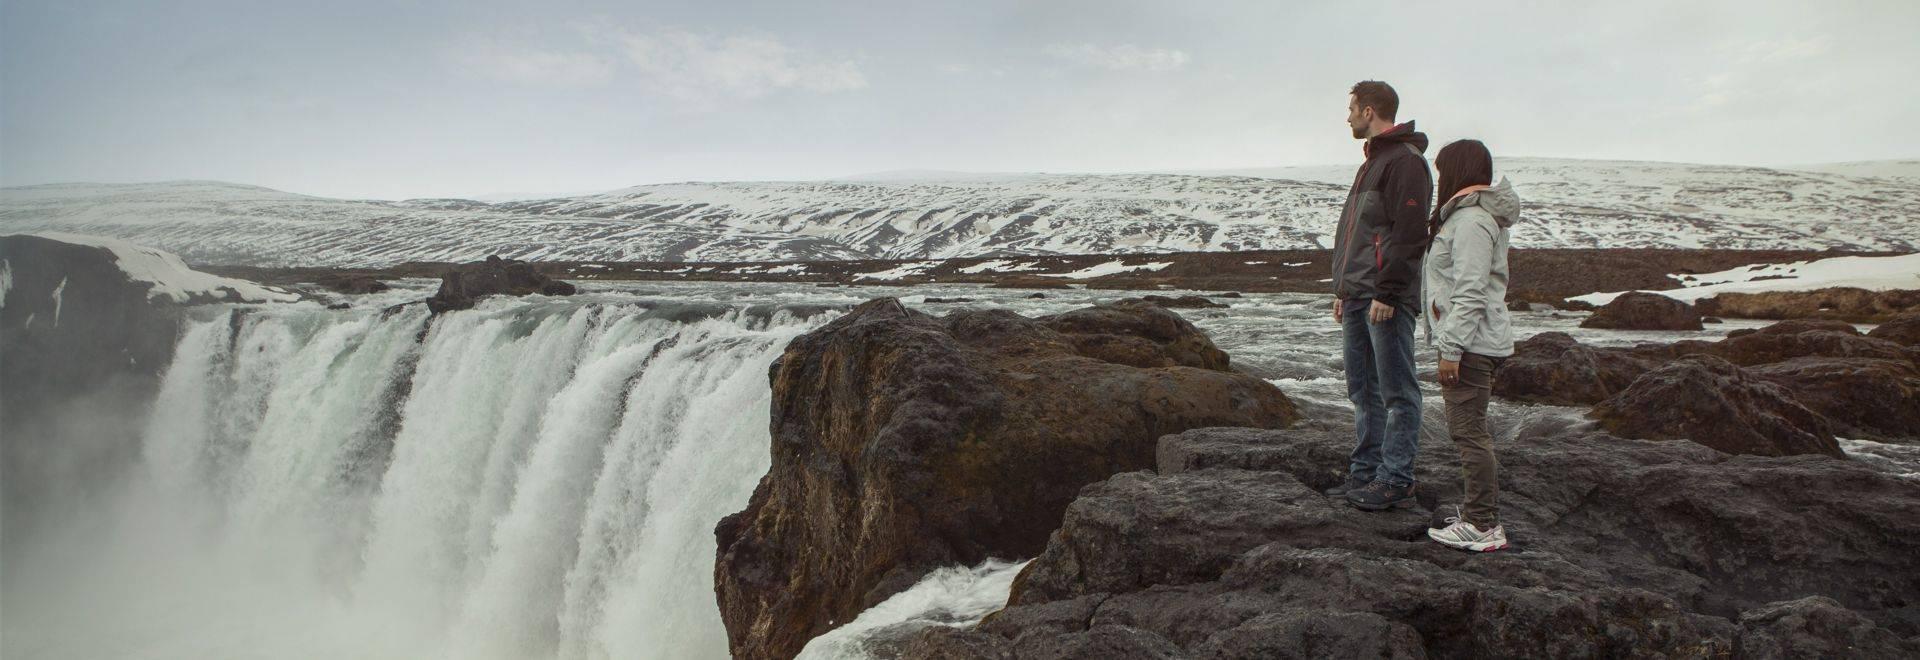 Iceland Akureyri Godafoss Waterfall Travellers-0M4A7573 processed Lg RGB.jpg